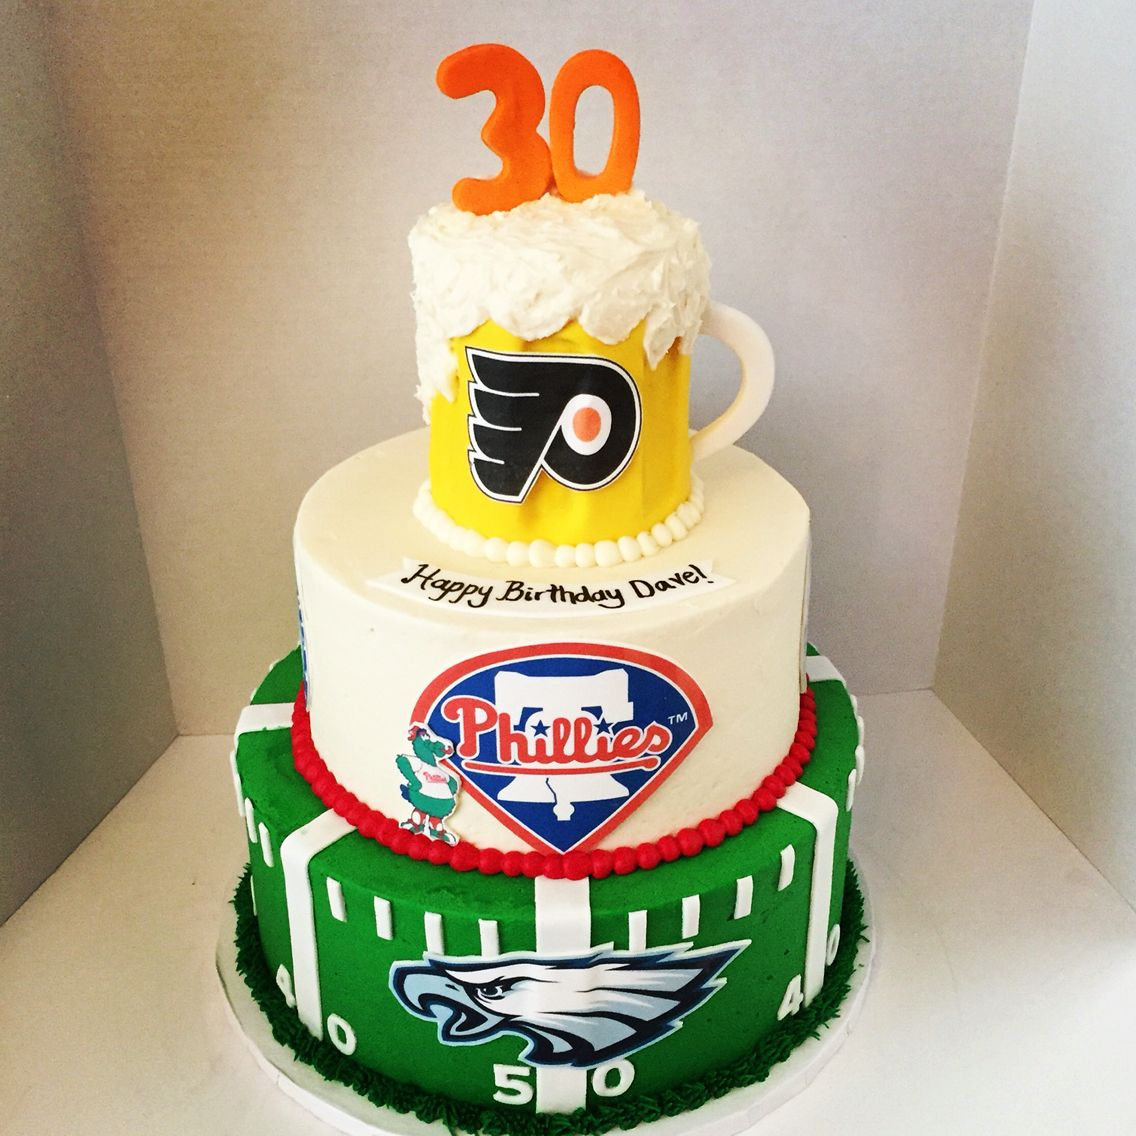 Philly Sports Cake Philadelphia Sports Cake 30th Birthday